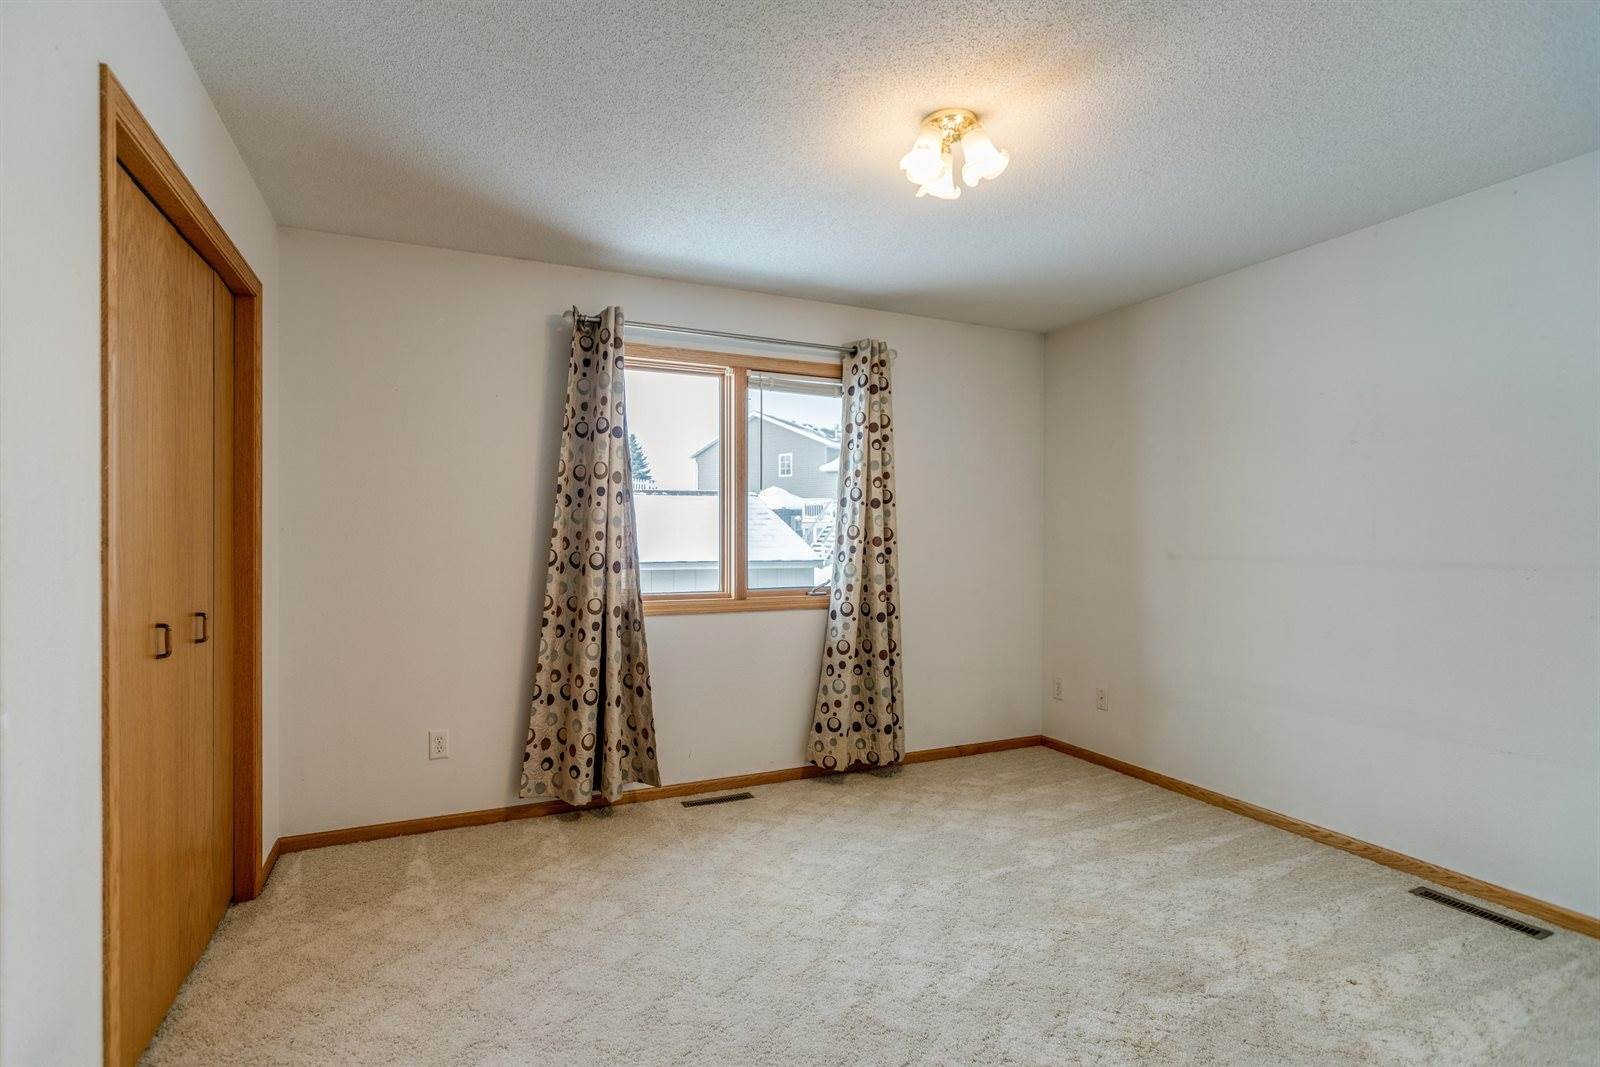 3508 Ridgecrest Drive, Bismarck, ND 58503